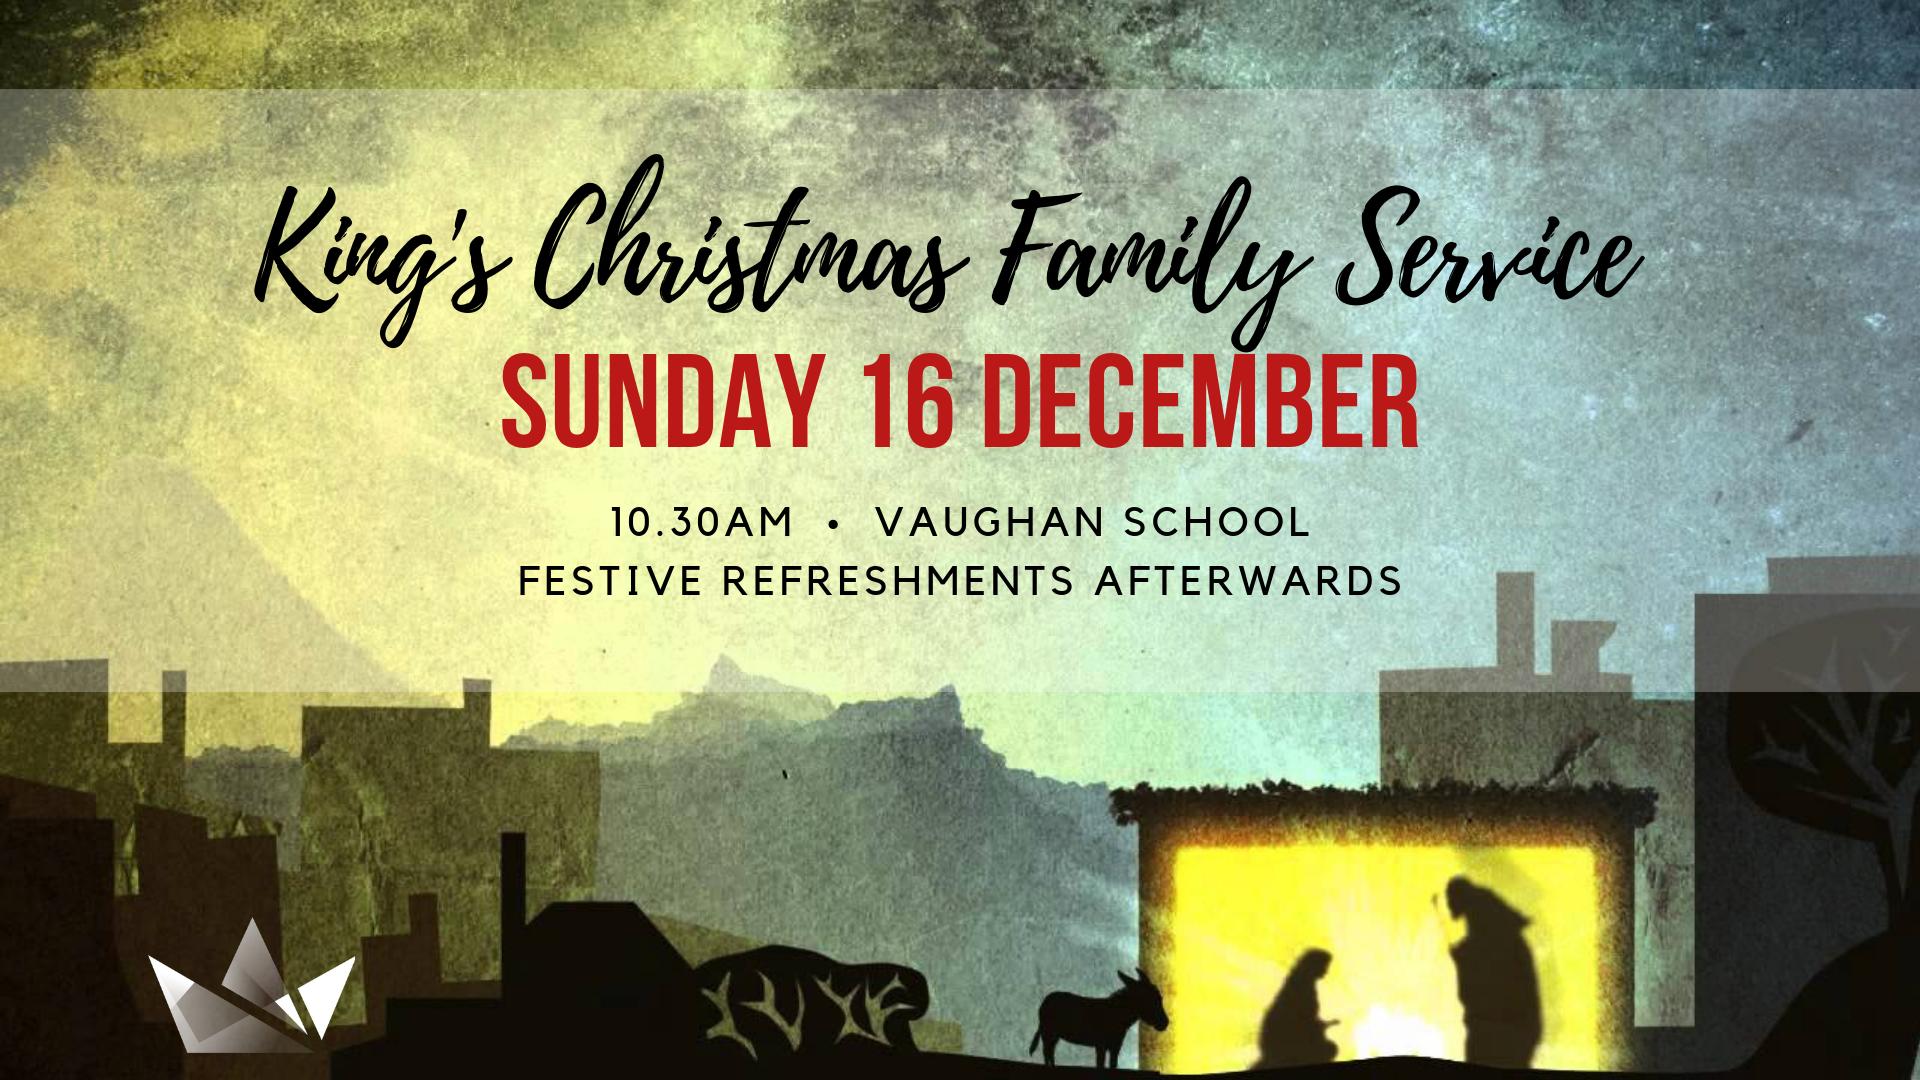 King's Christmas Family Service